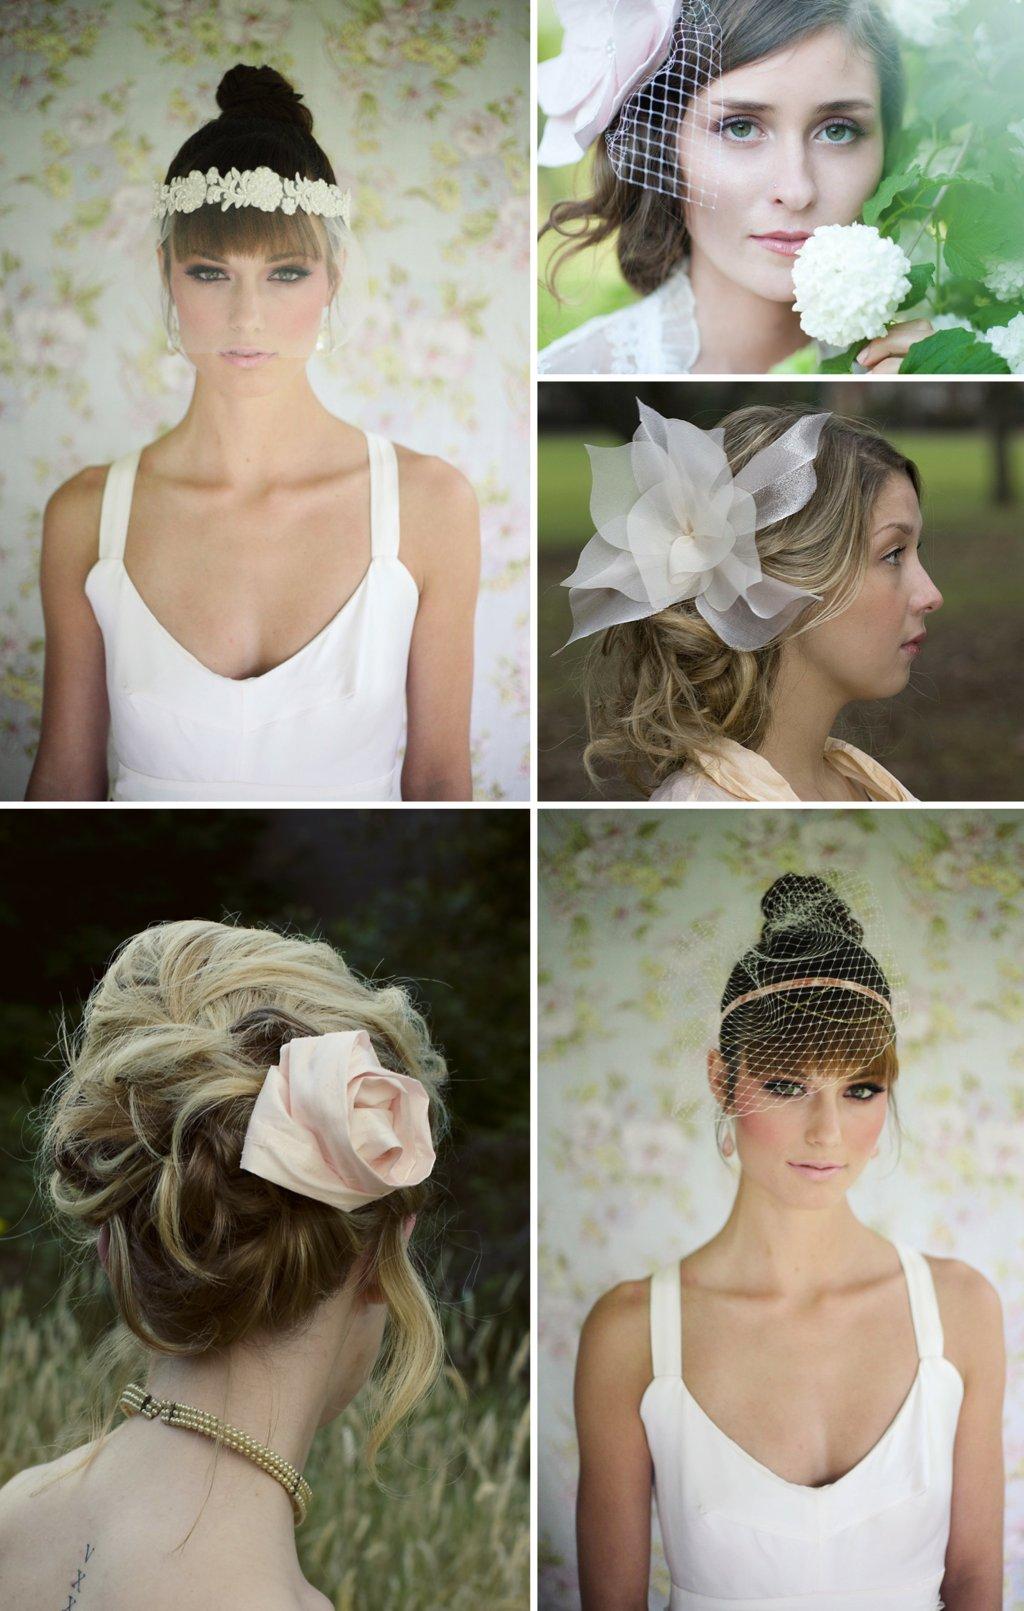 Summer-brides-guide-to-wedding-veils-bridal-hair-accessories-1.full